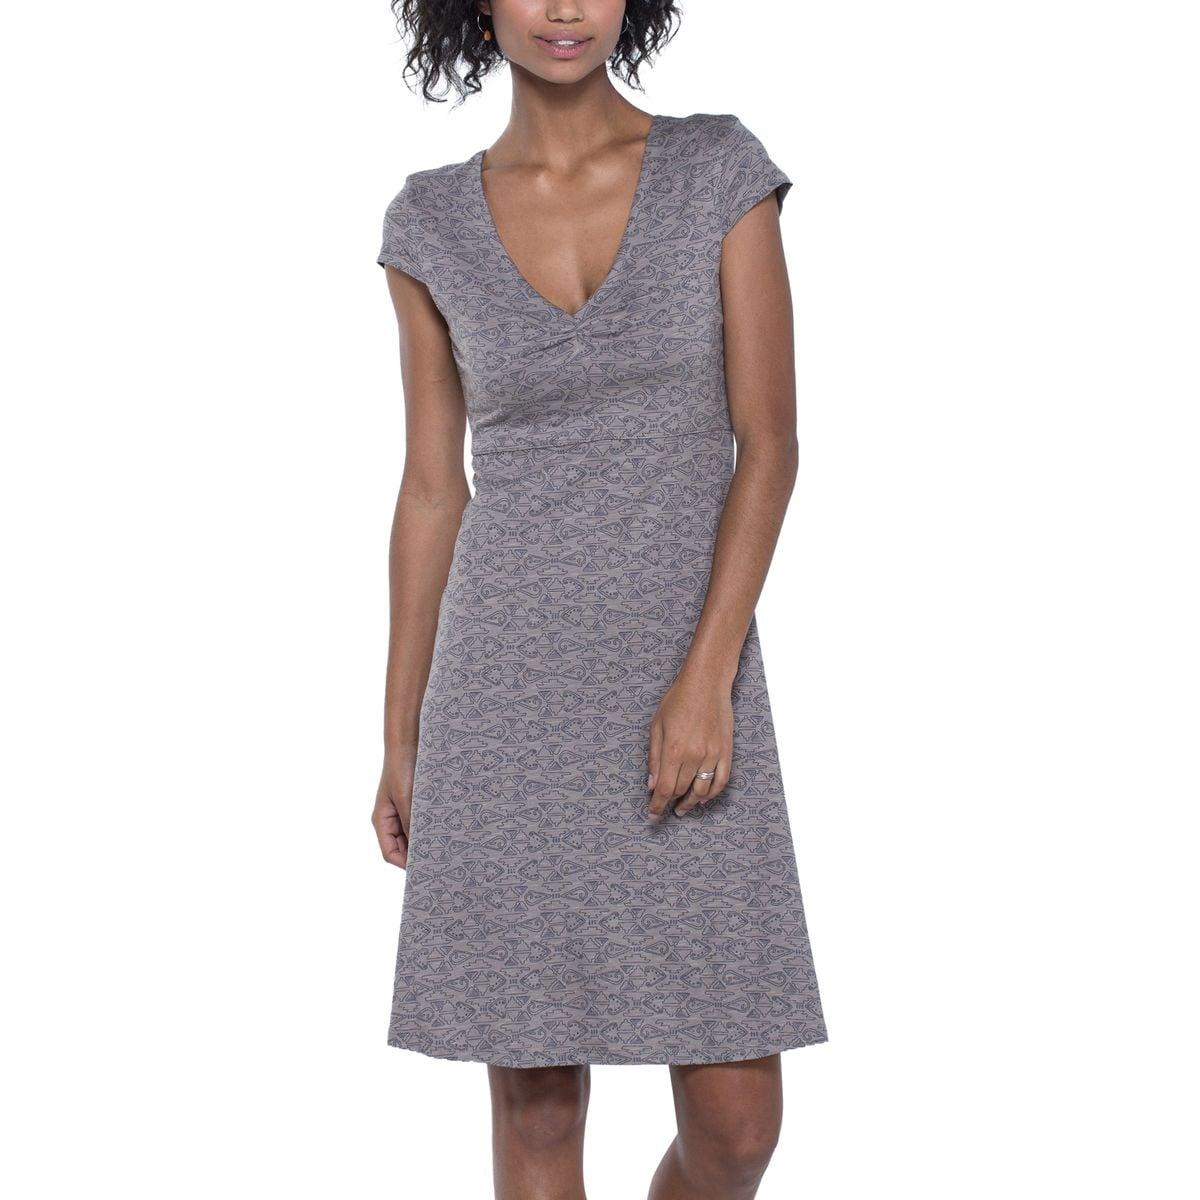 Rosemarie Dress - Women